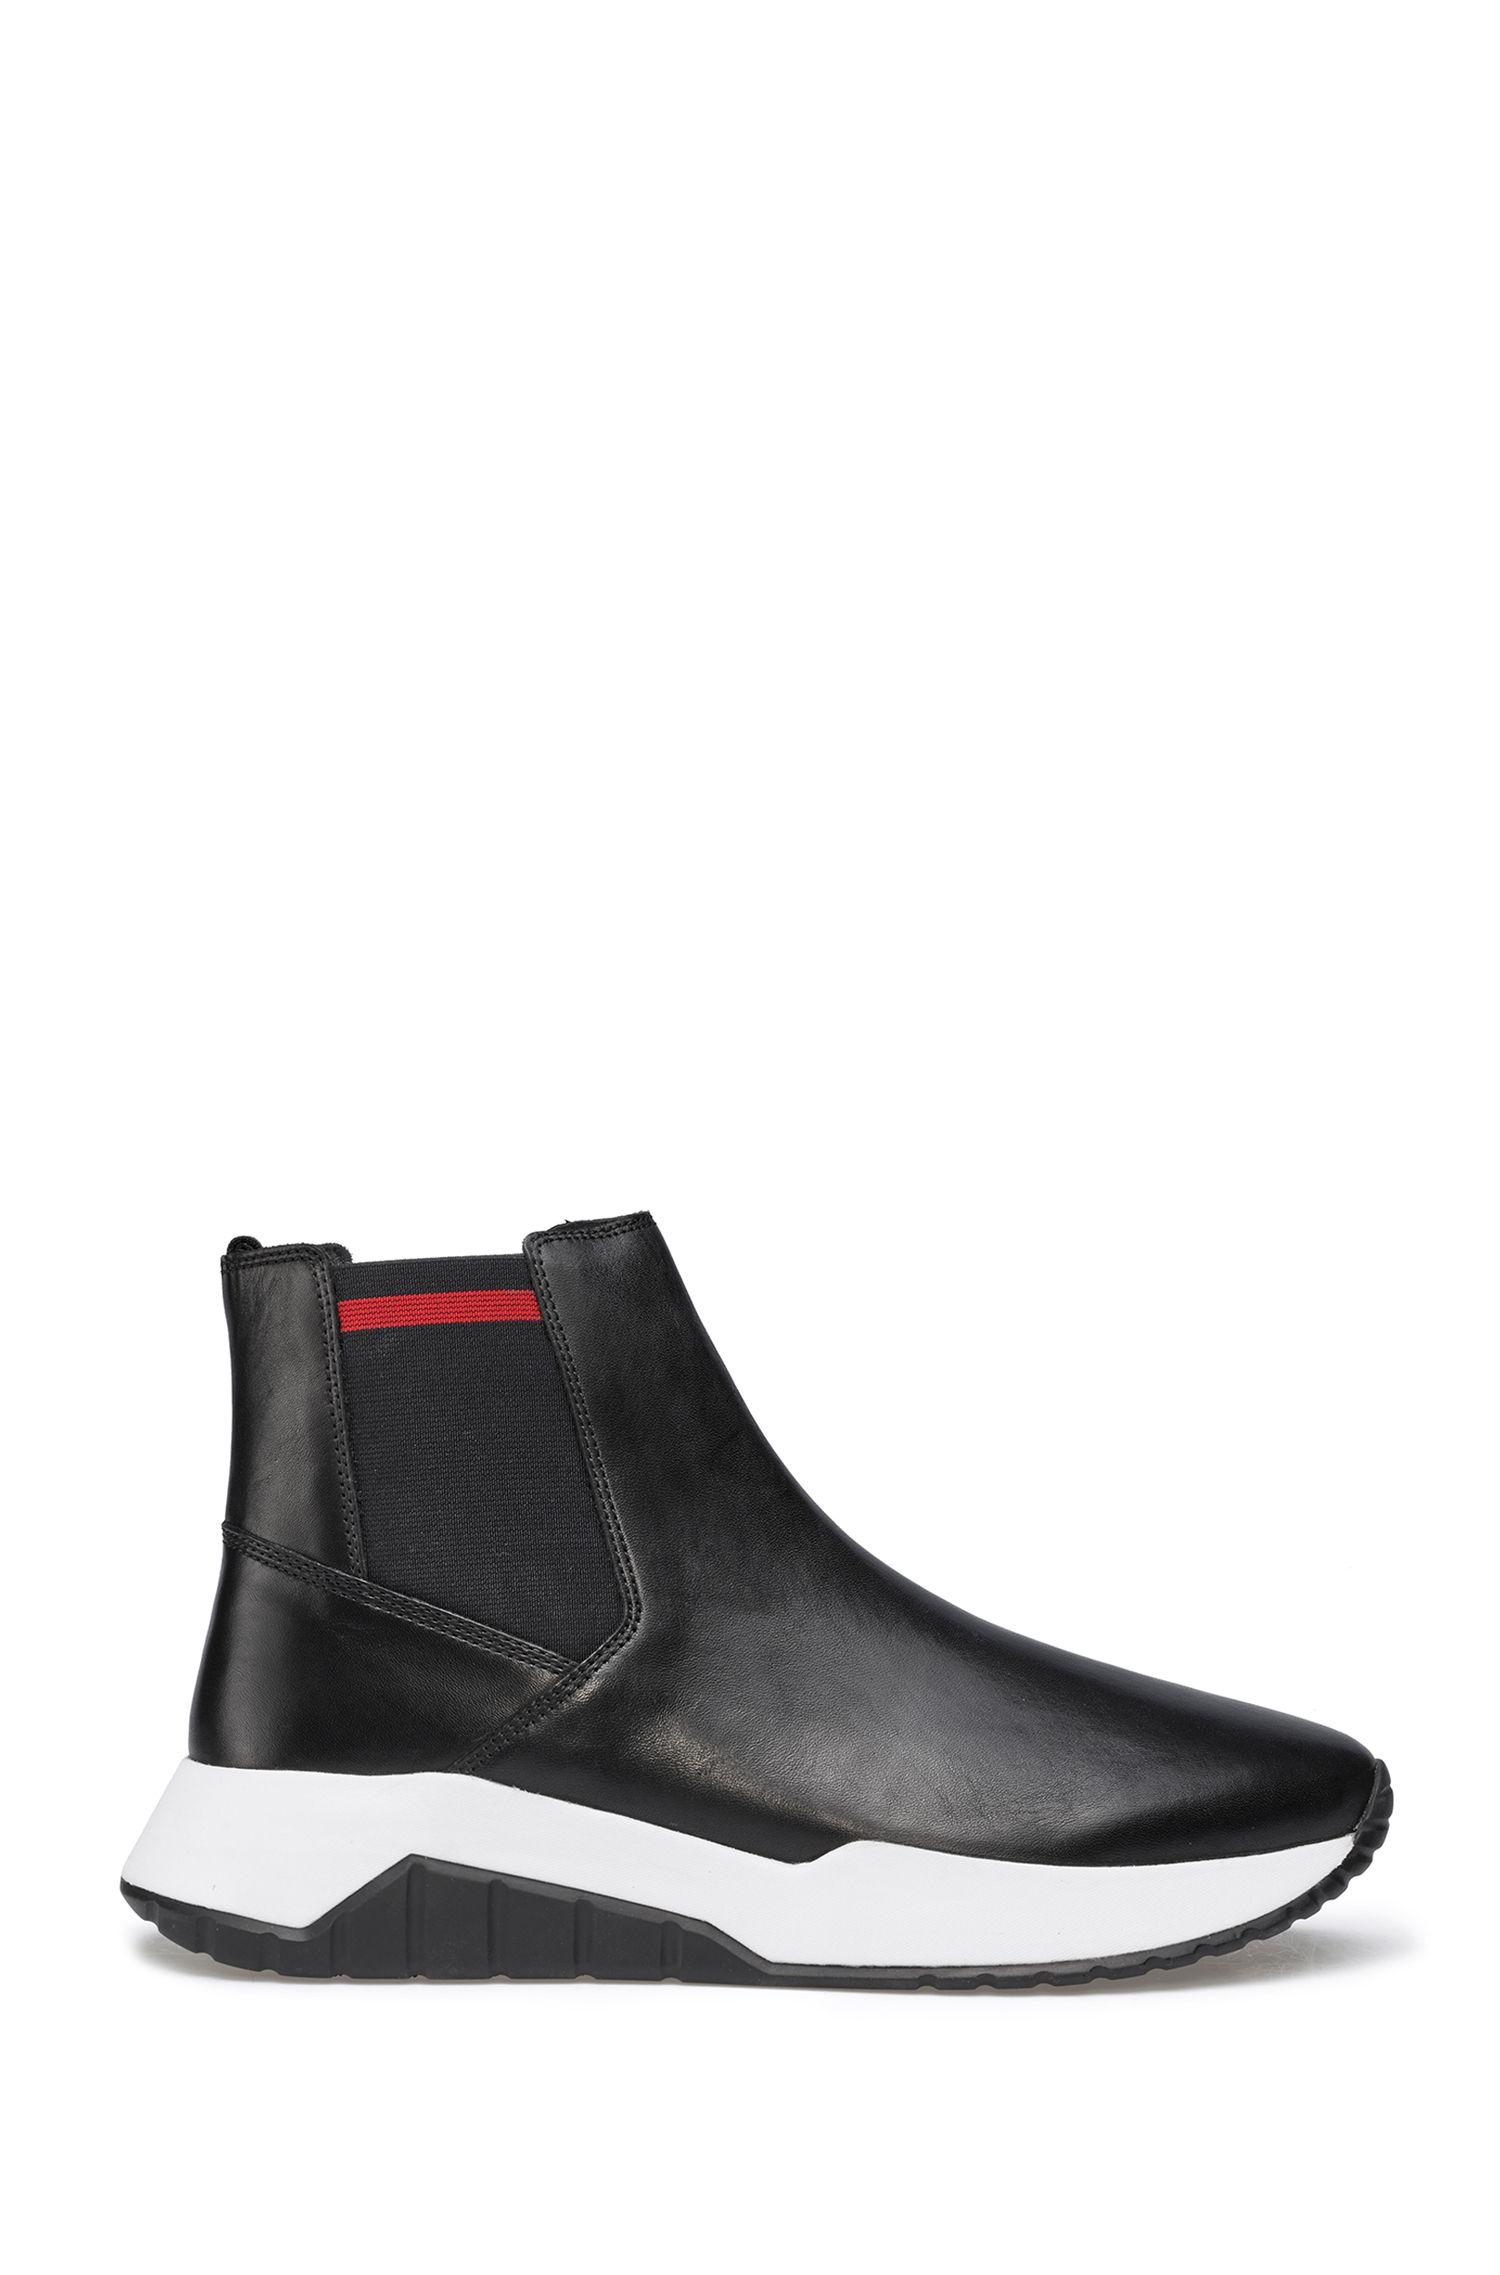 Chelsea Boots aus Nappaleder mit kontrastfarbener Sohle, Schwarz